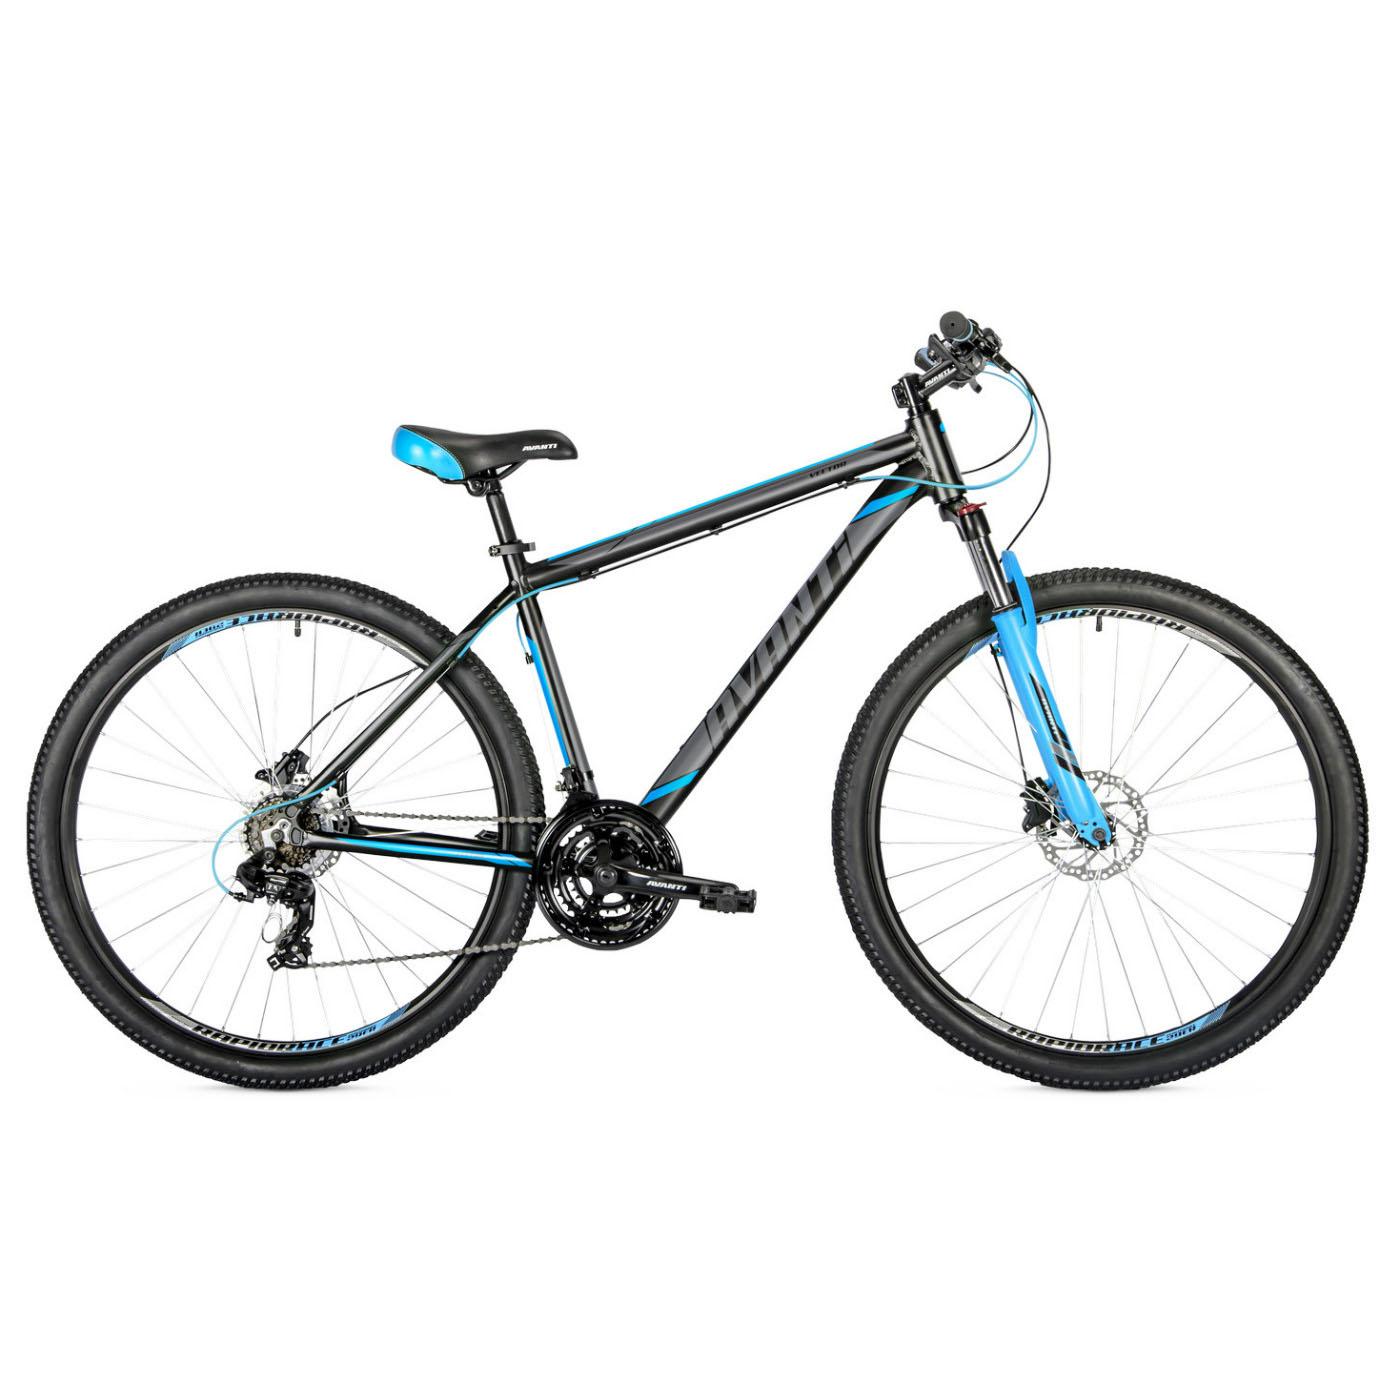 Фото Горный Велосипед   29 Avanti Vector disk 2018 вилка Lock Out черно-синий